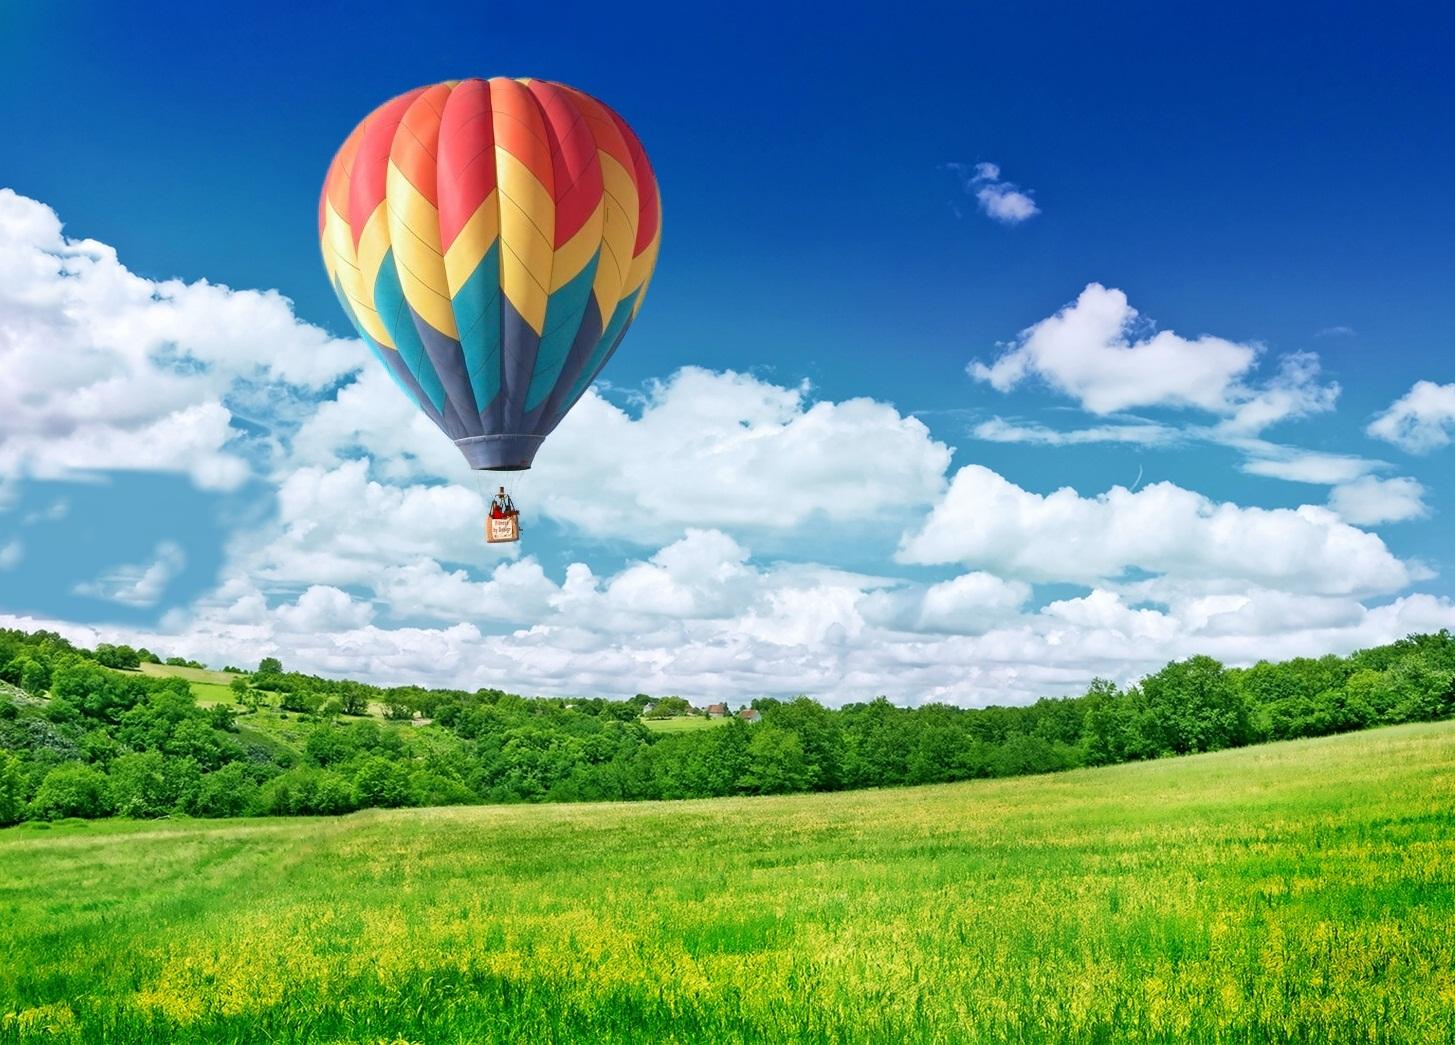 Balloon Classic Wallpaper Desktop 5660 Hd Wallpapers ibwallcom 1455x1045